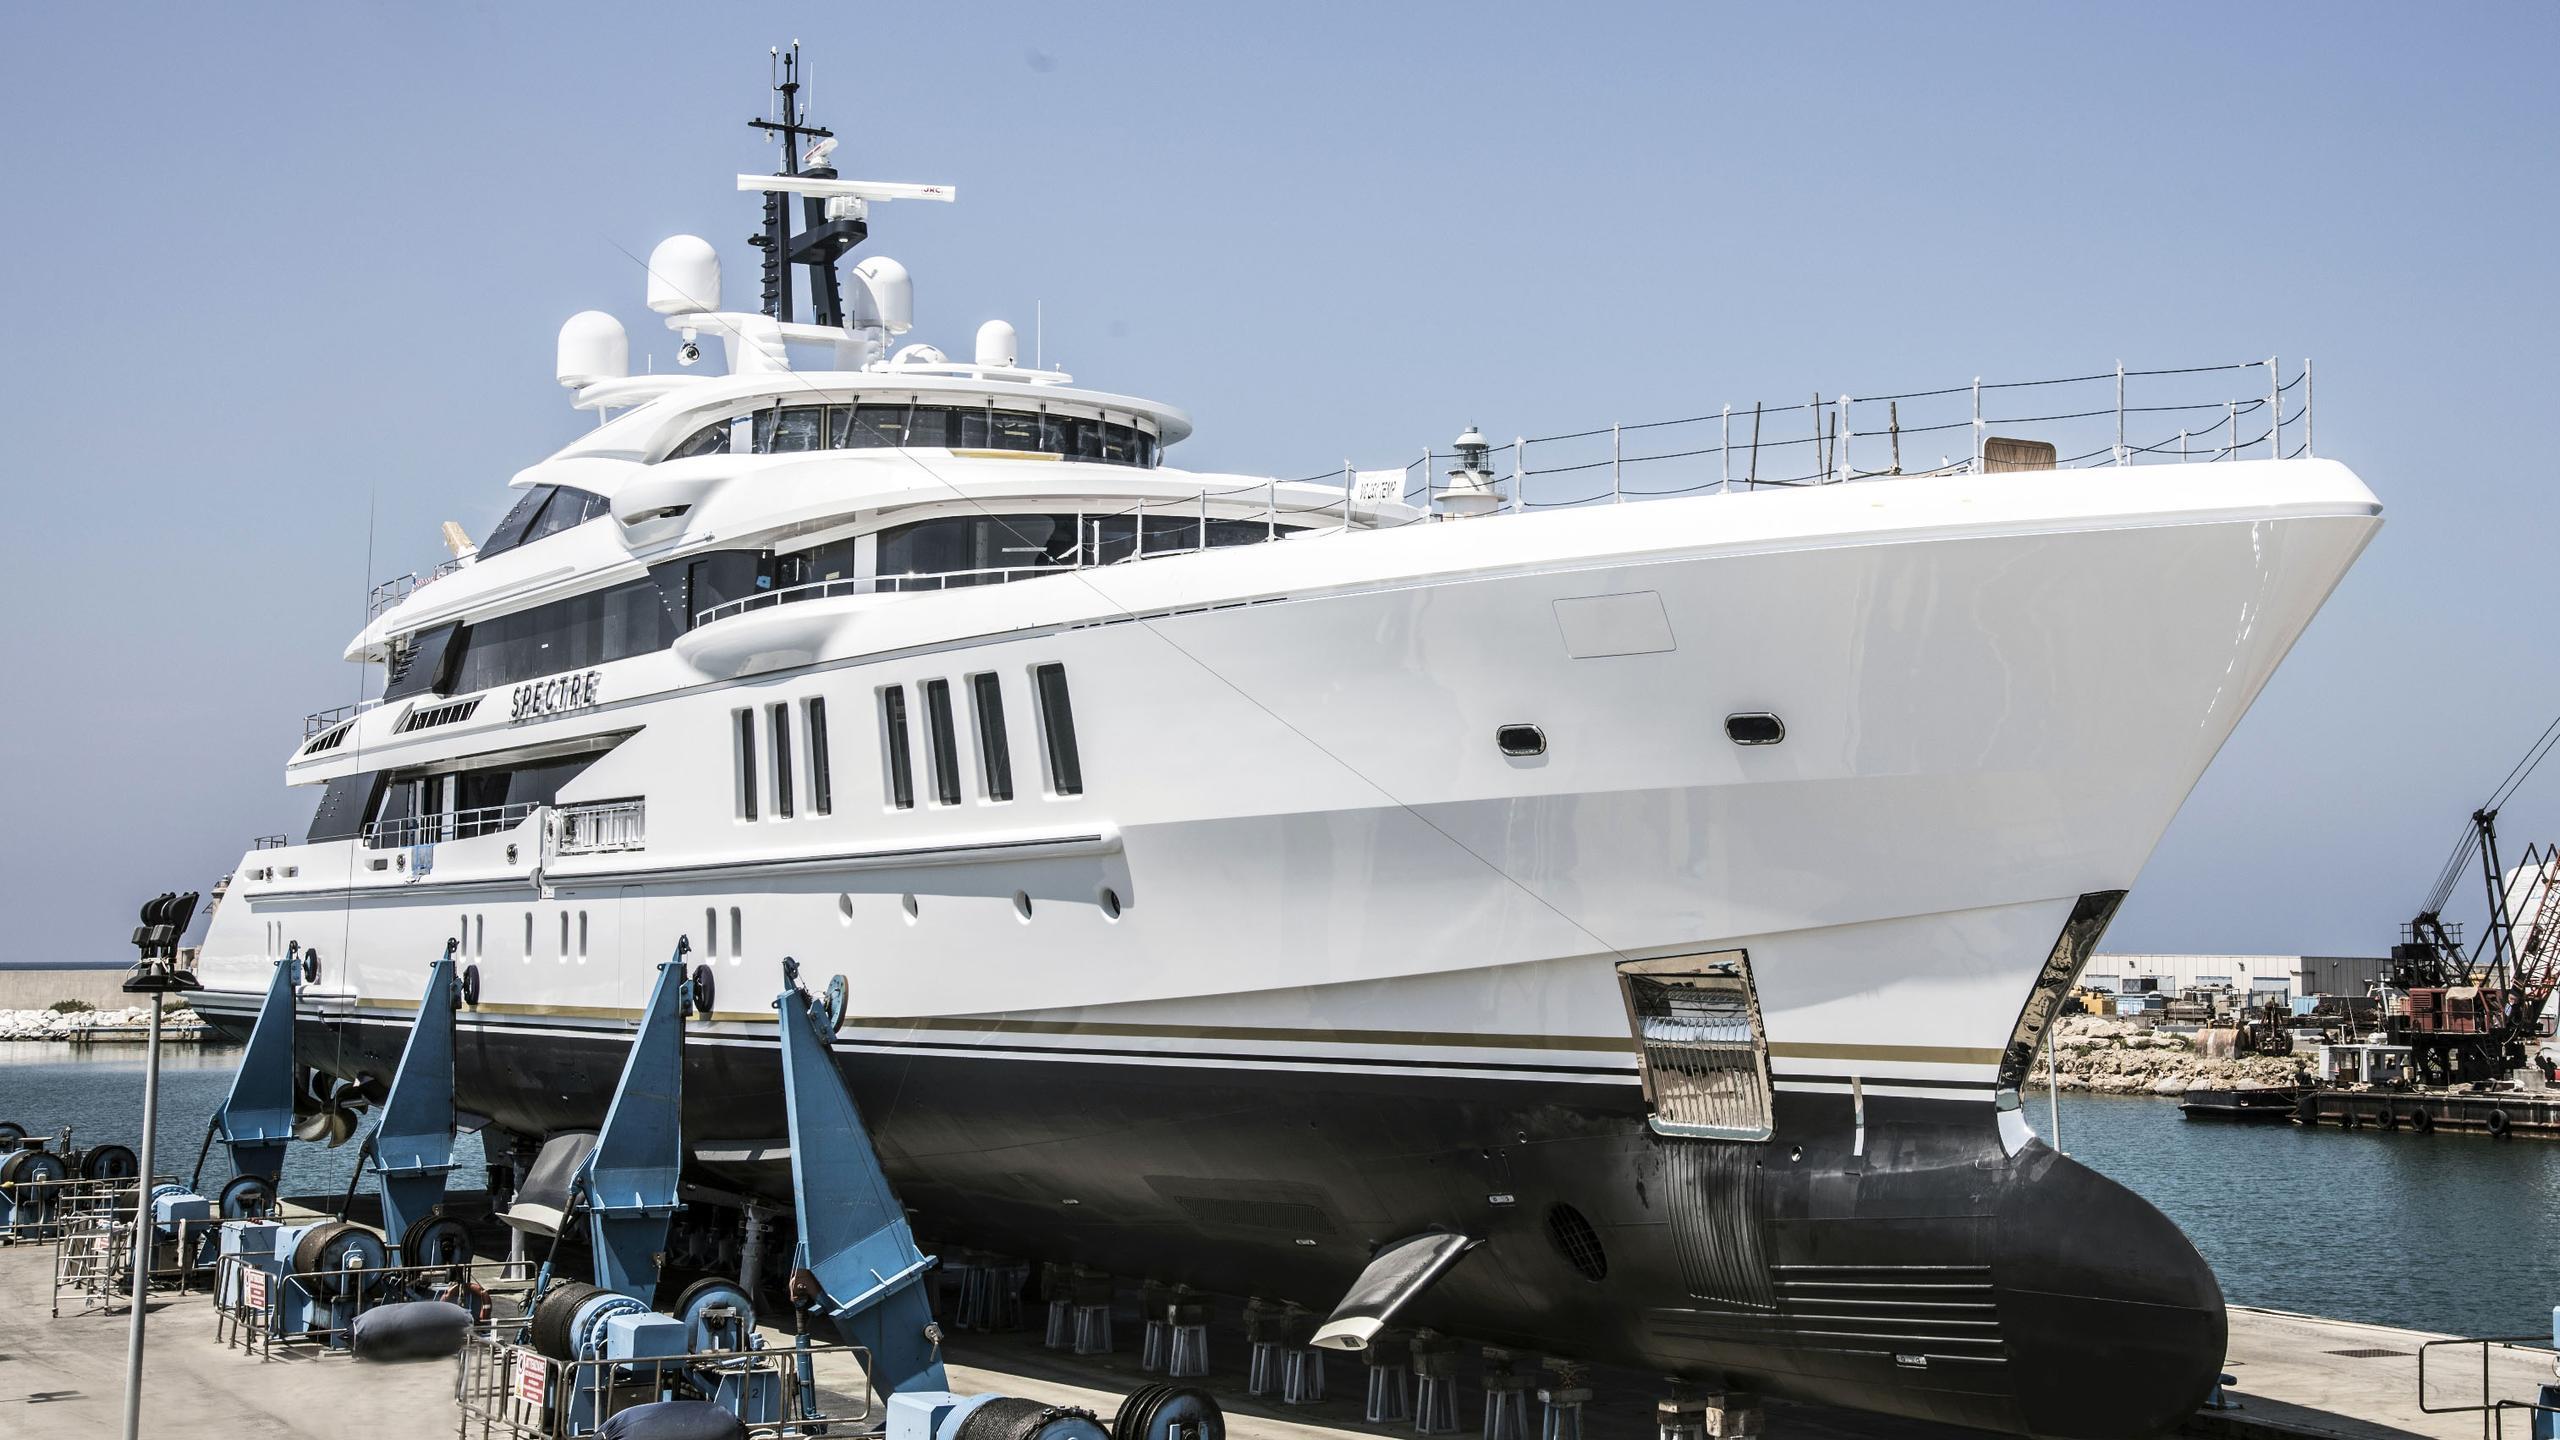 spectre motoryacht benetti yachts fb269 launch half profile